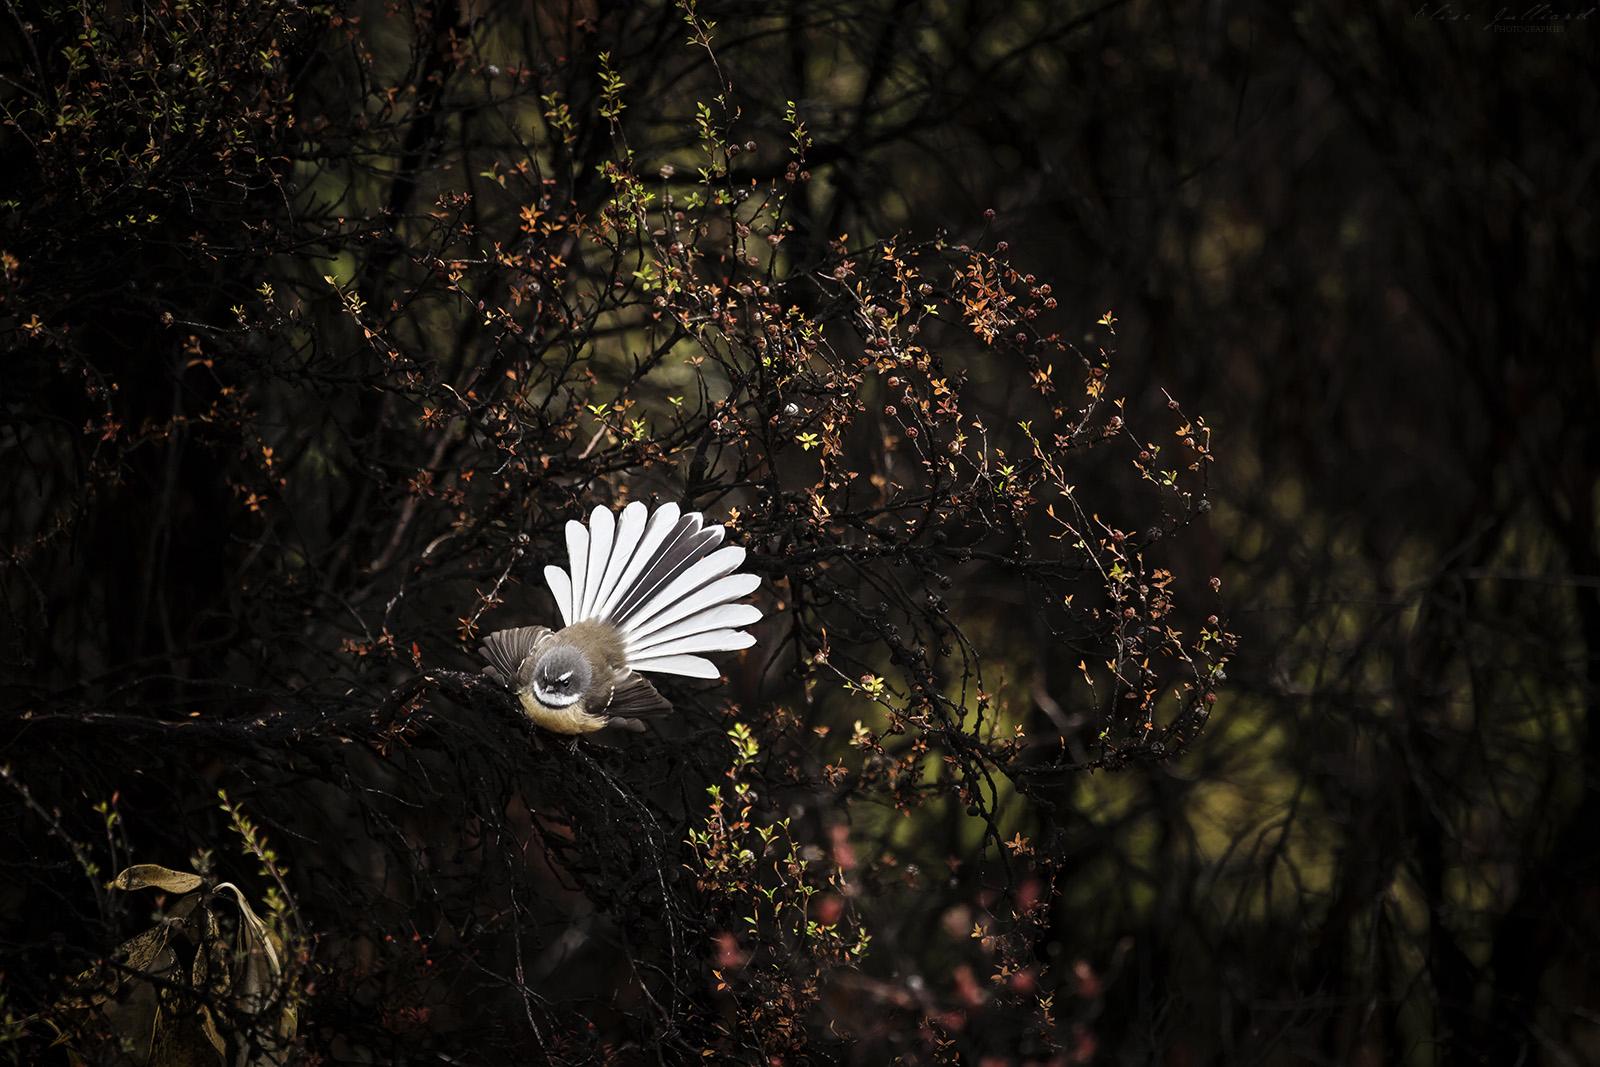 voyage-nouvelle-zelande-new-zealand-travel-south-island-queenstown-bird-animal-oiseau-animal-aotearoa-fantail-rhipidure-à-collier-eventail